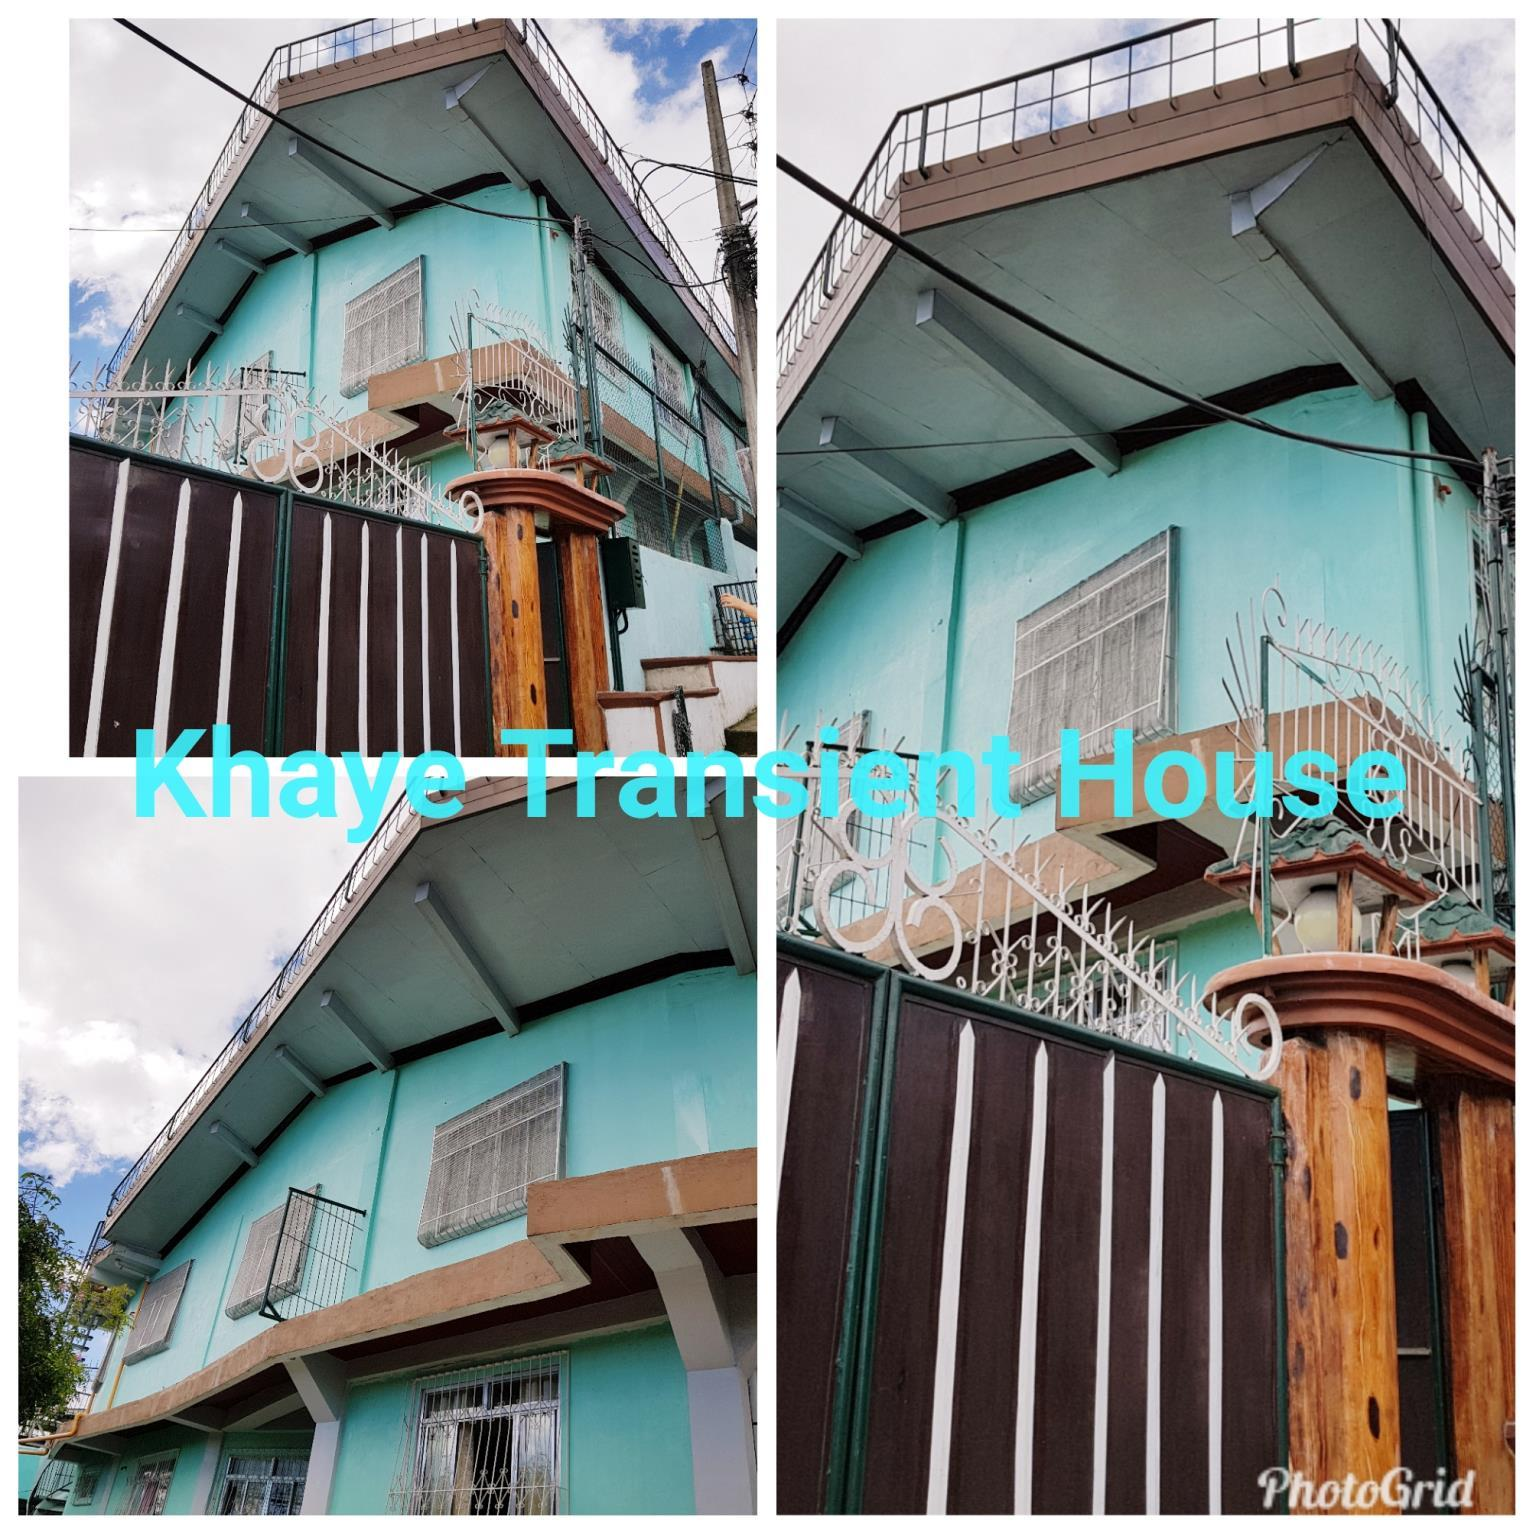 Khaye Transient House